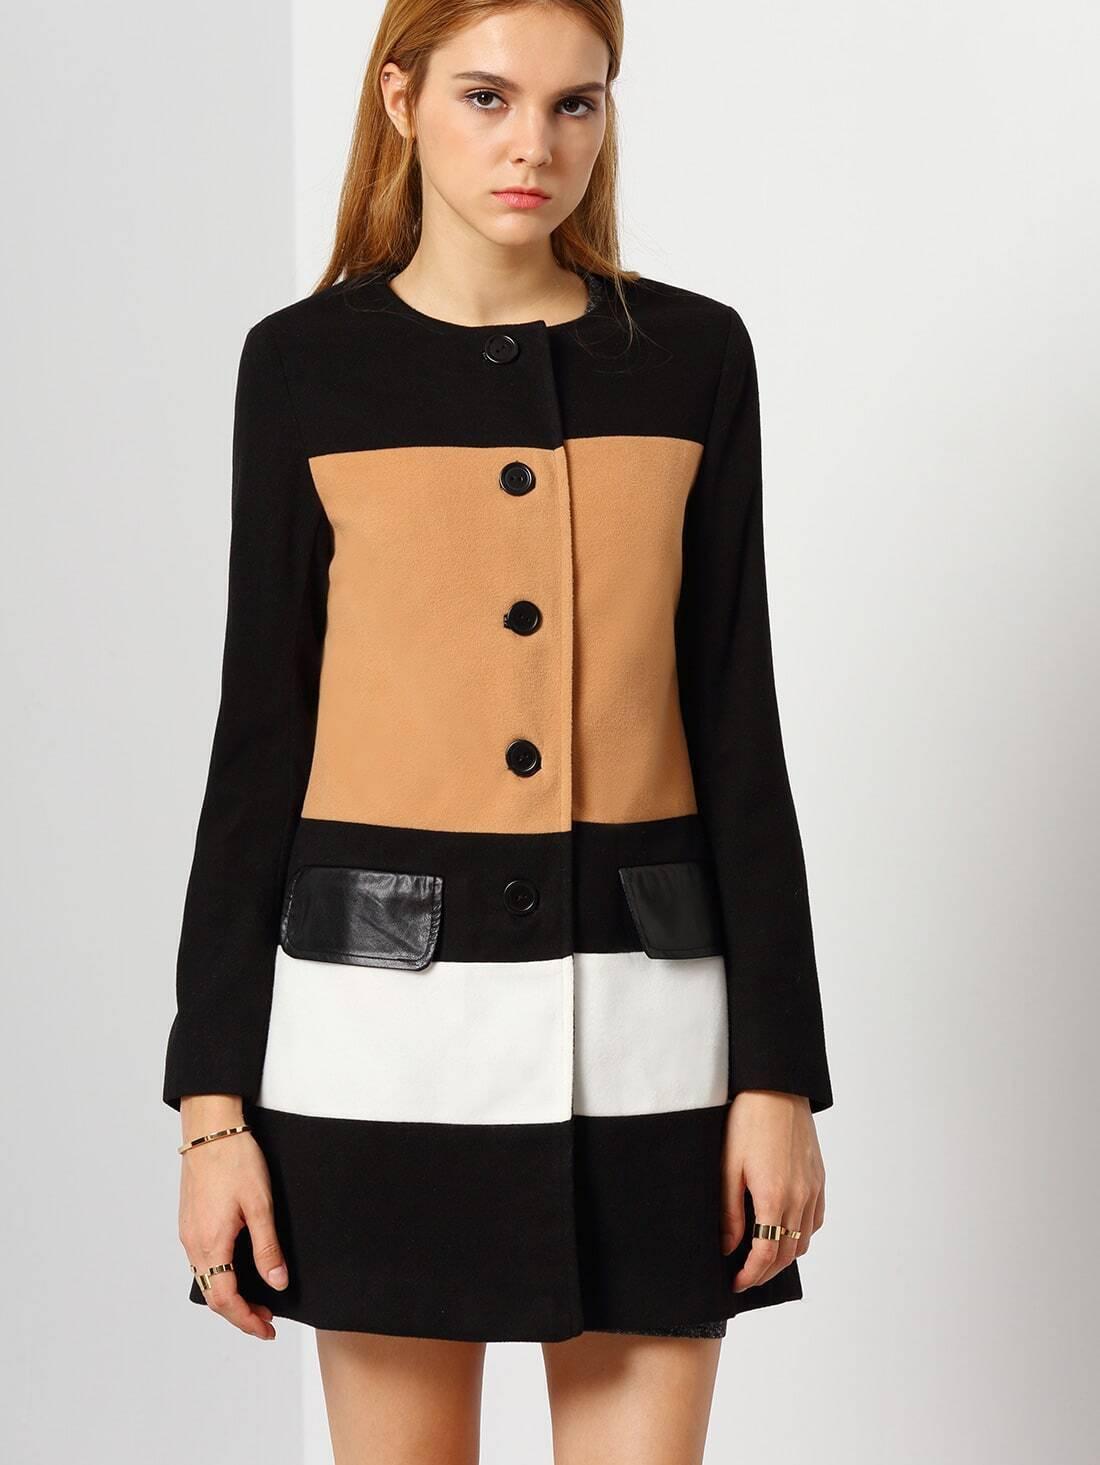 Black Camel Long Sleeve Color Block Coat